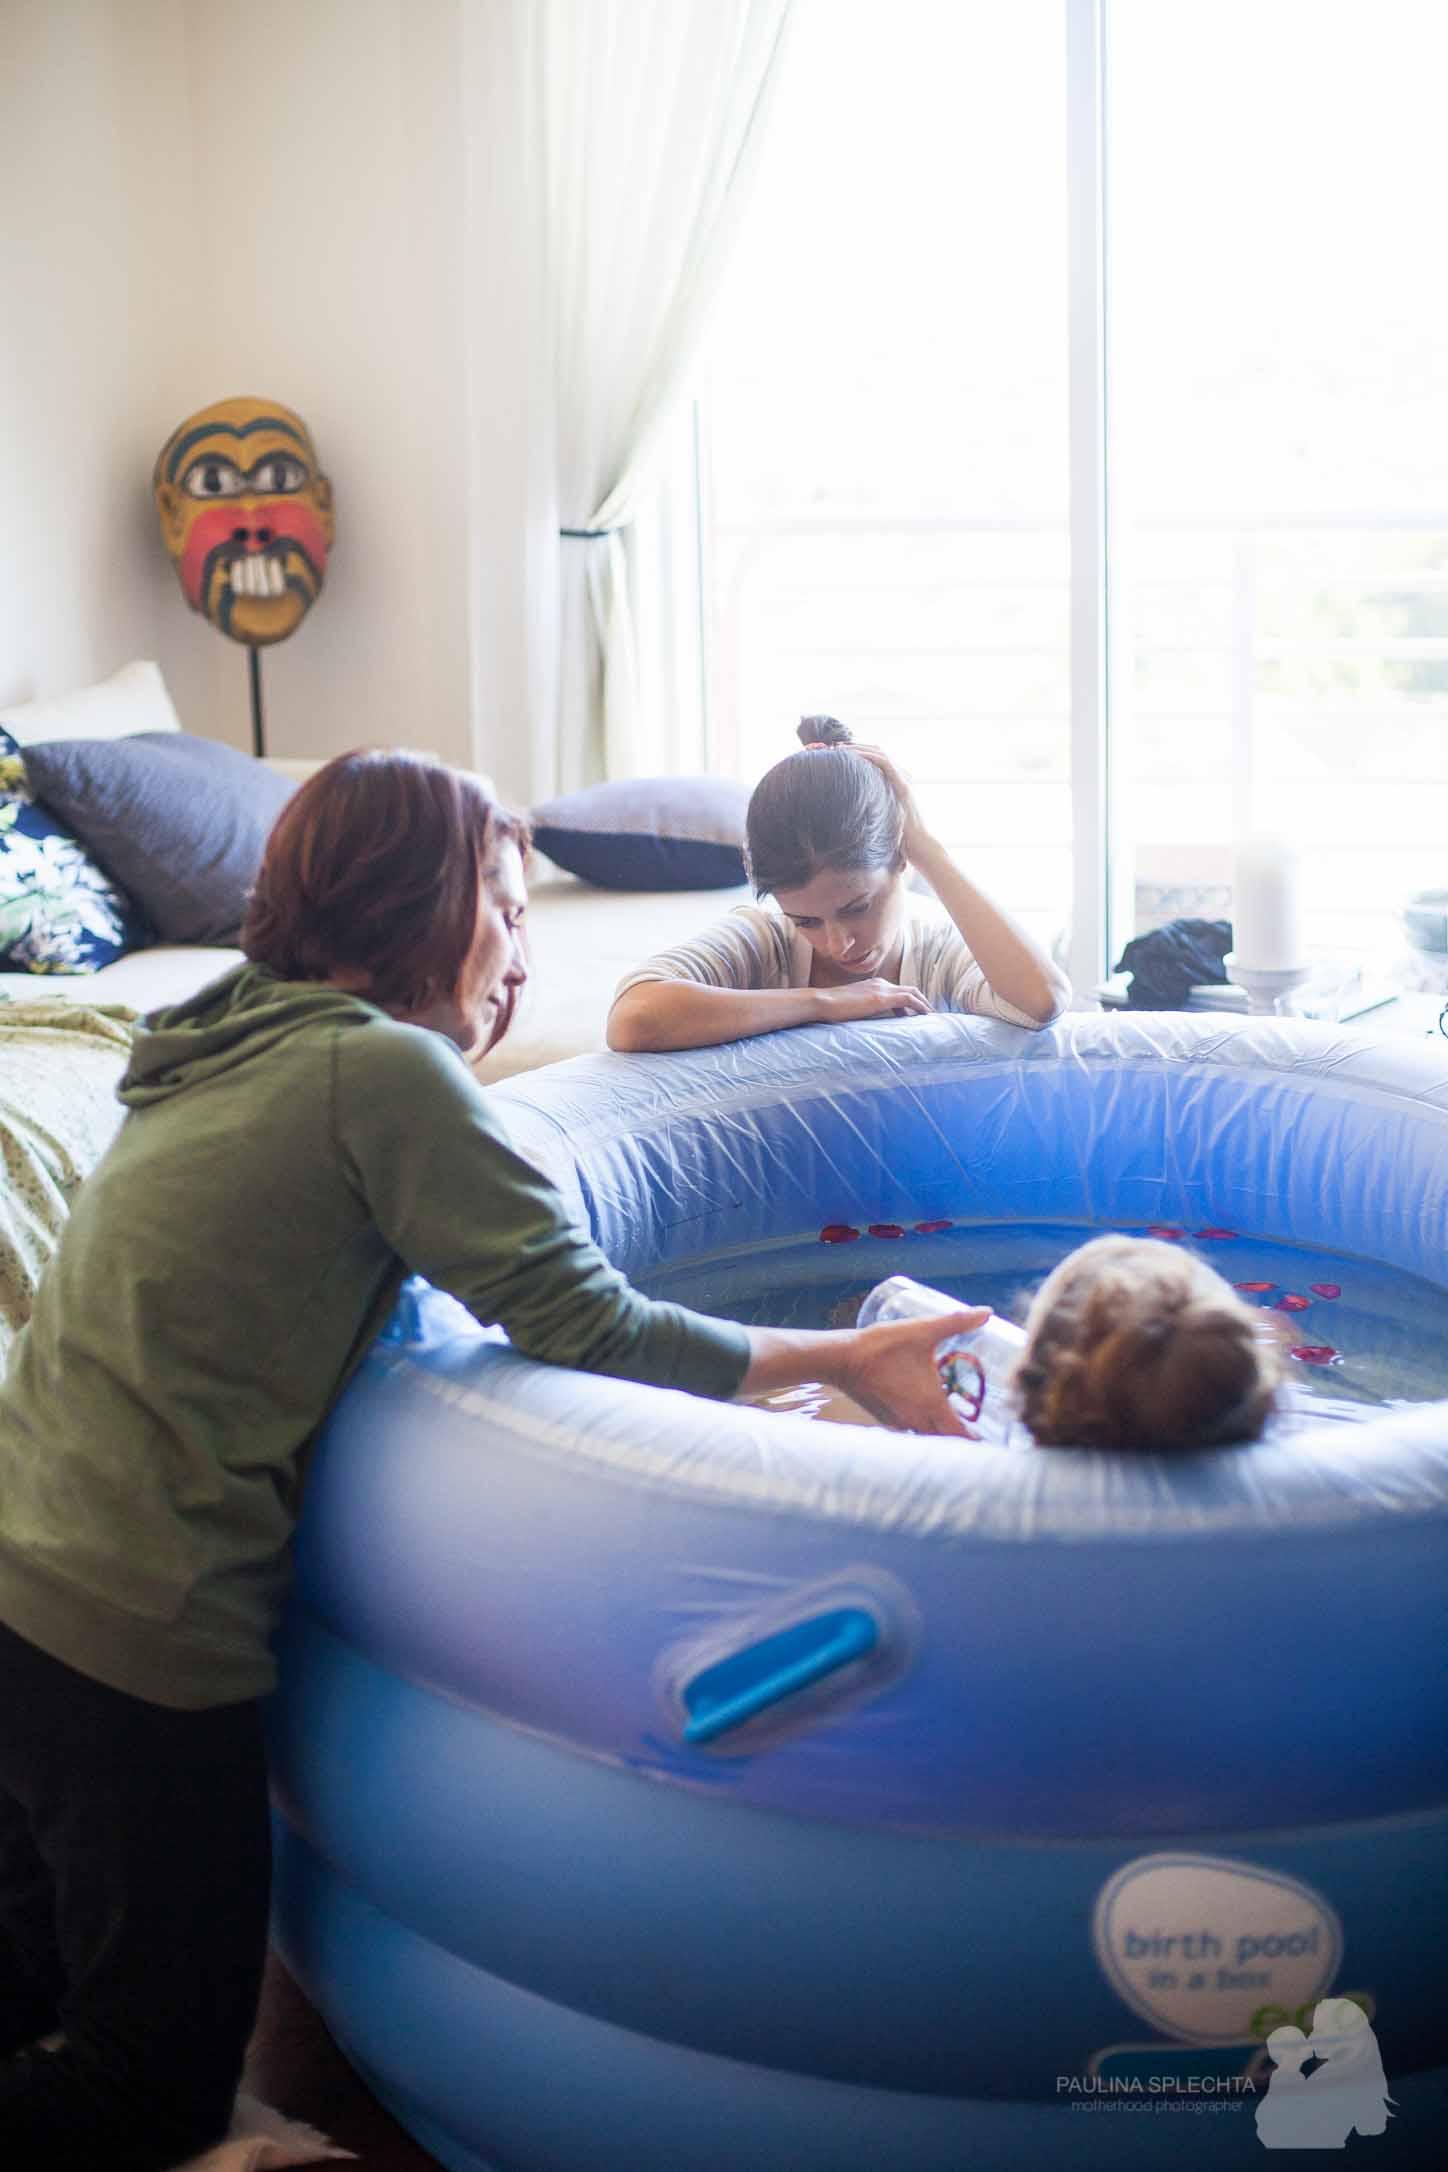 birth-photographer-boca-photography-near-me-birth-center-delray-beach-hollywood-breastfeeding-doula-midwife-childbirth-2.jpg